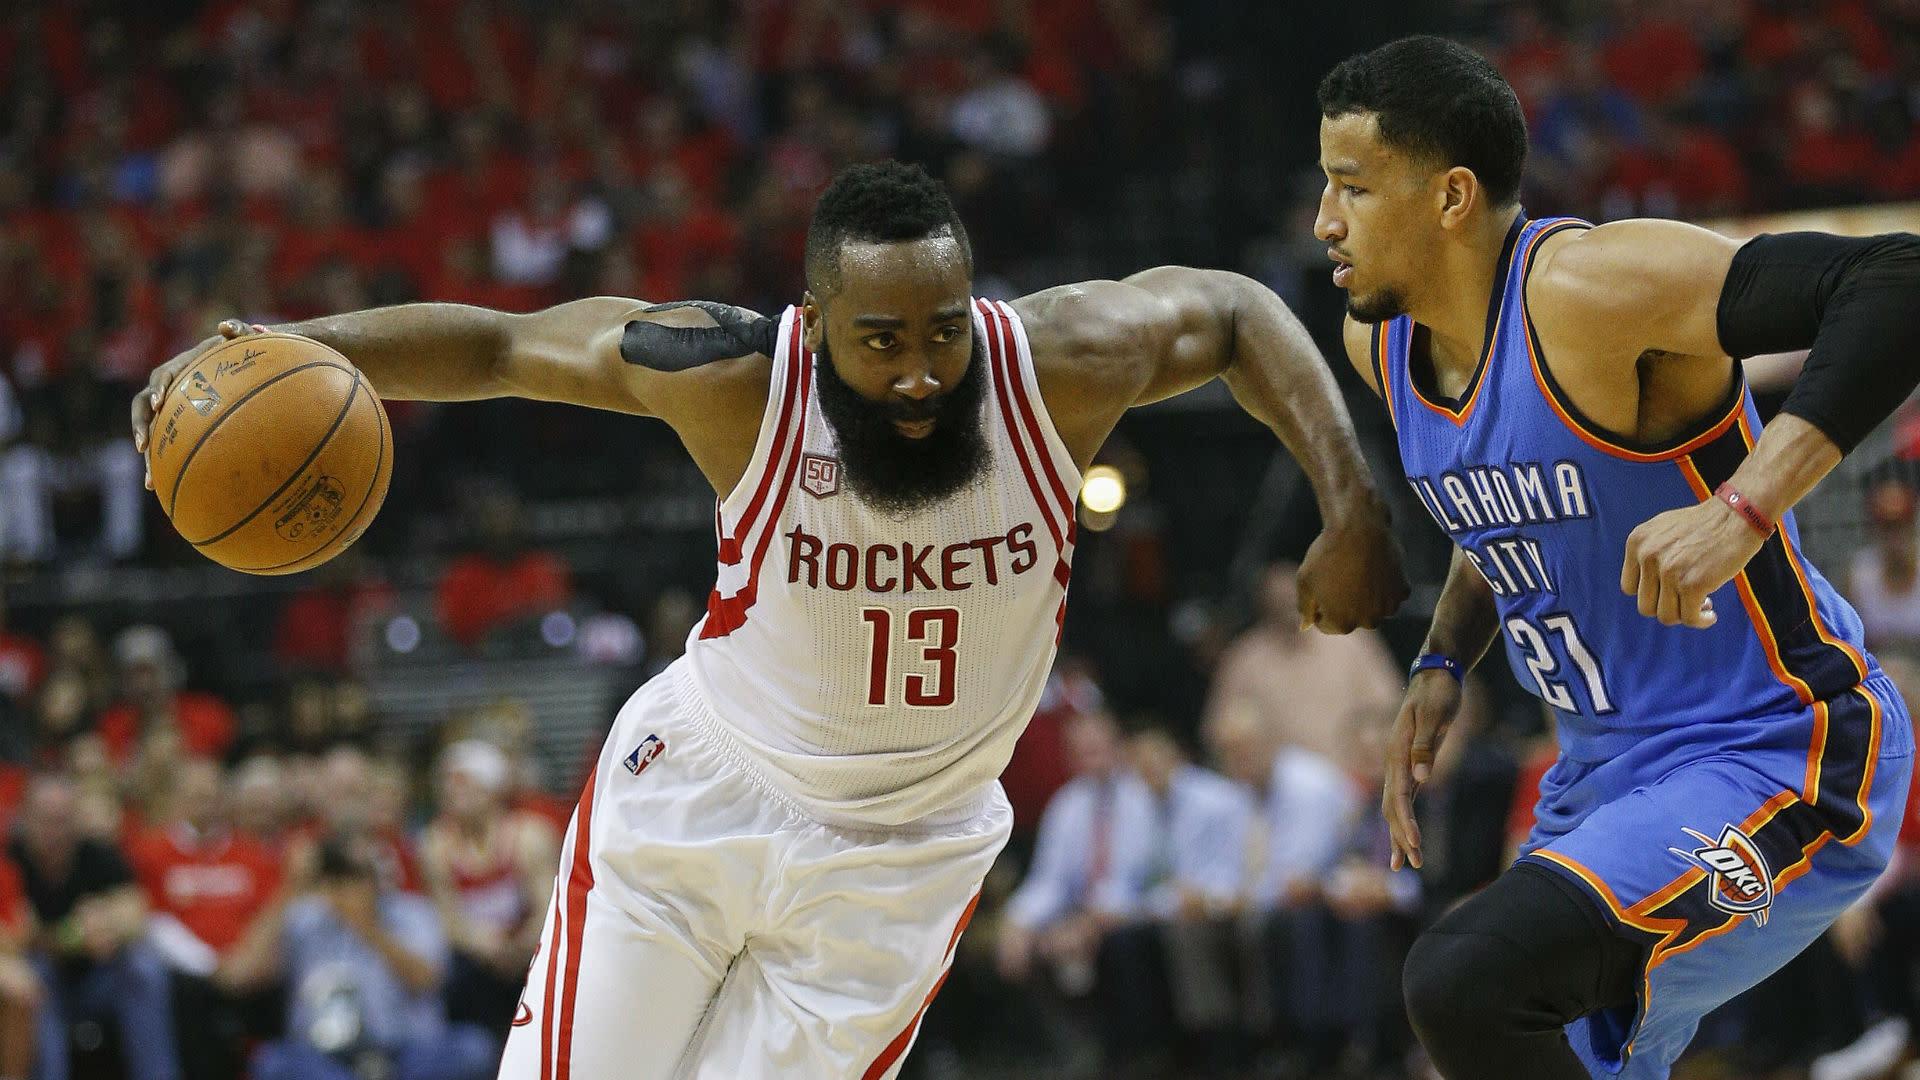 Rockets vs. Thunder: Score, results, highlights from OKC's ... Rockets Score